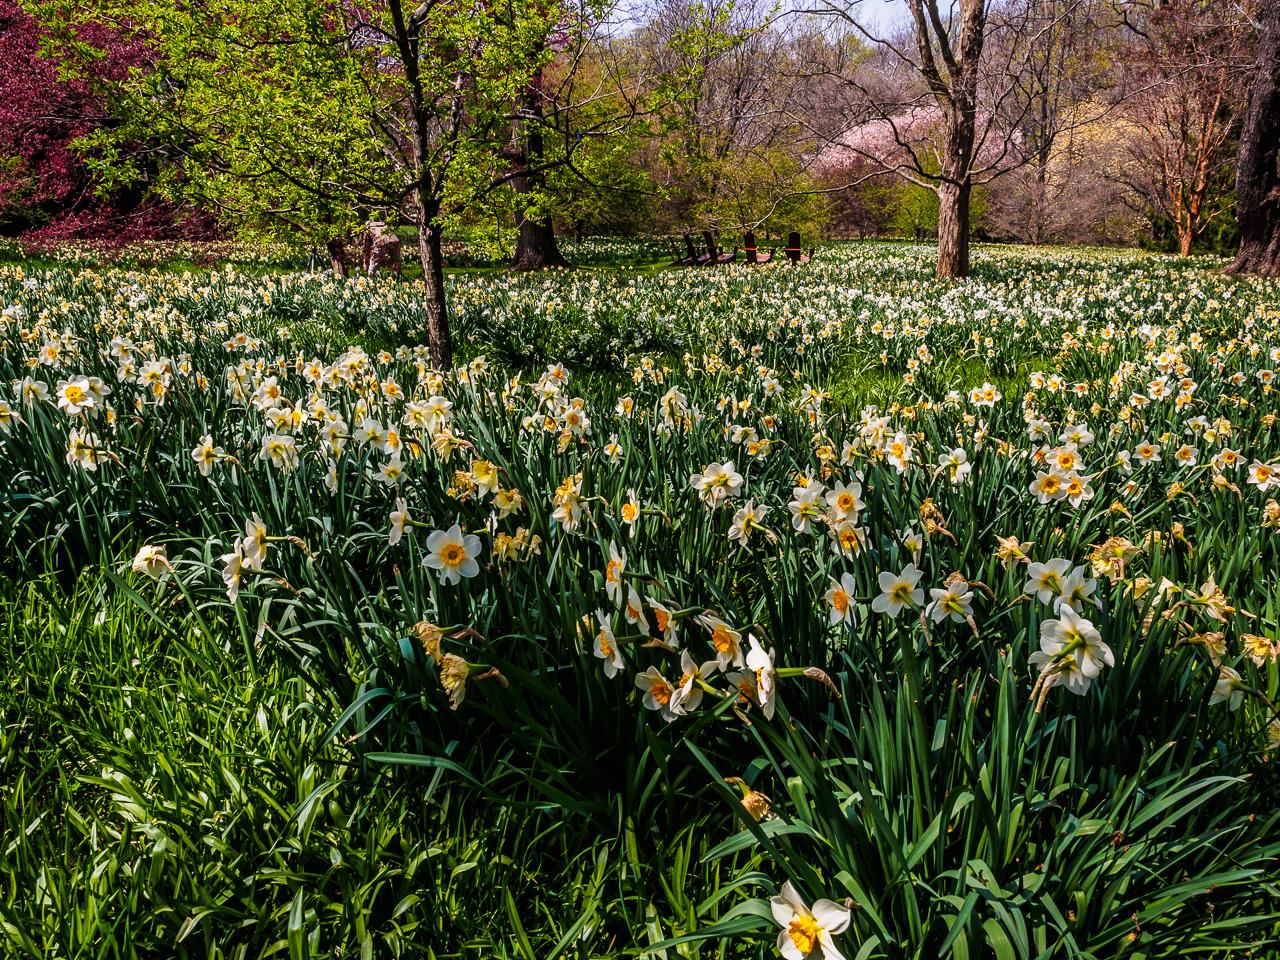 Chanticleers field of daffodils flowers photograph